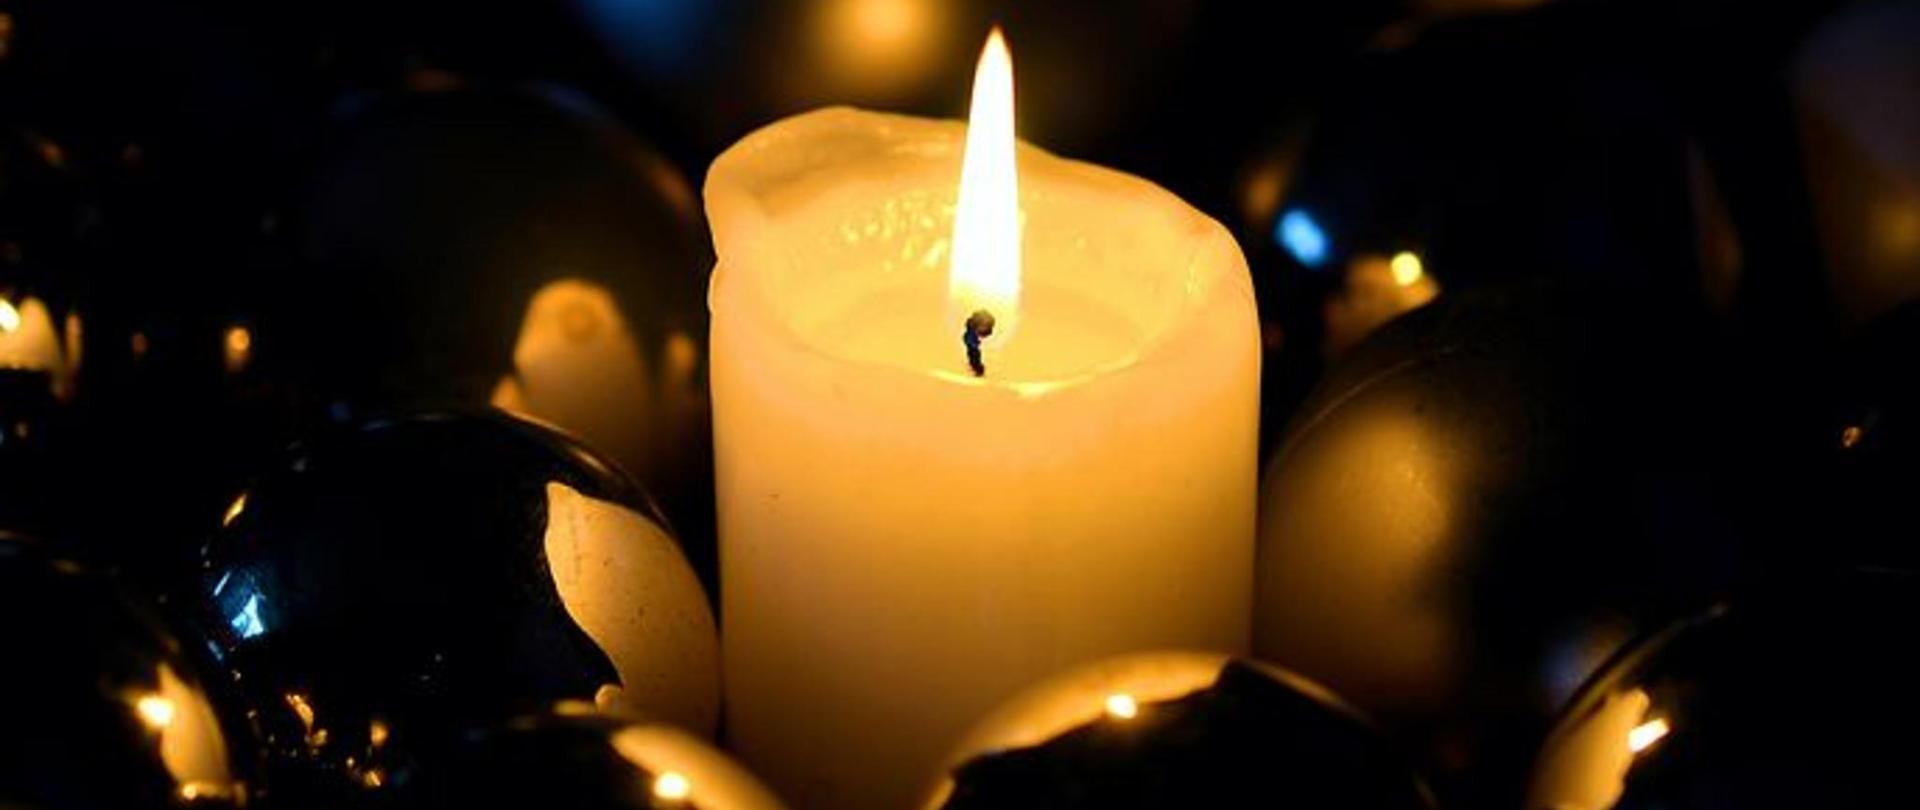 candle-552790__480.jpg